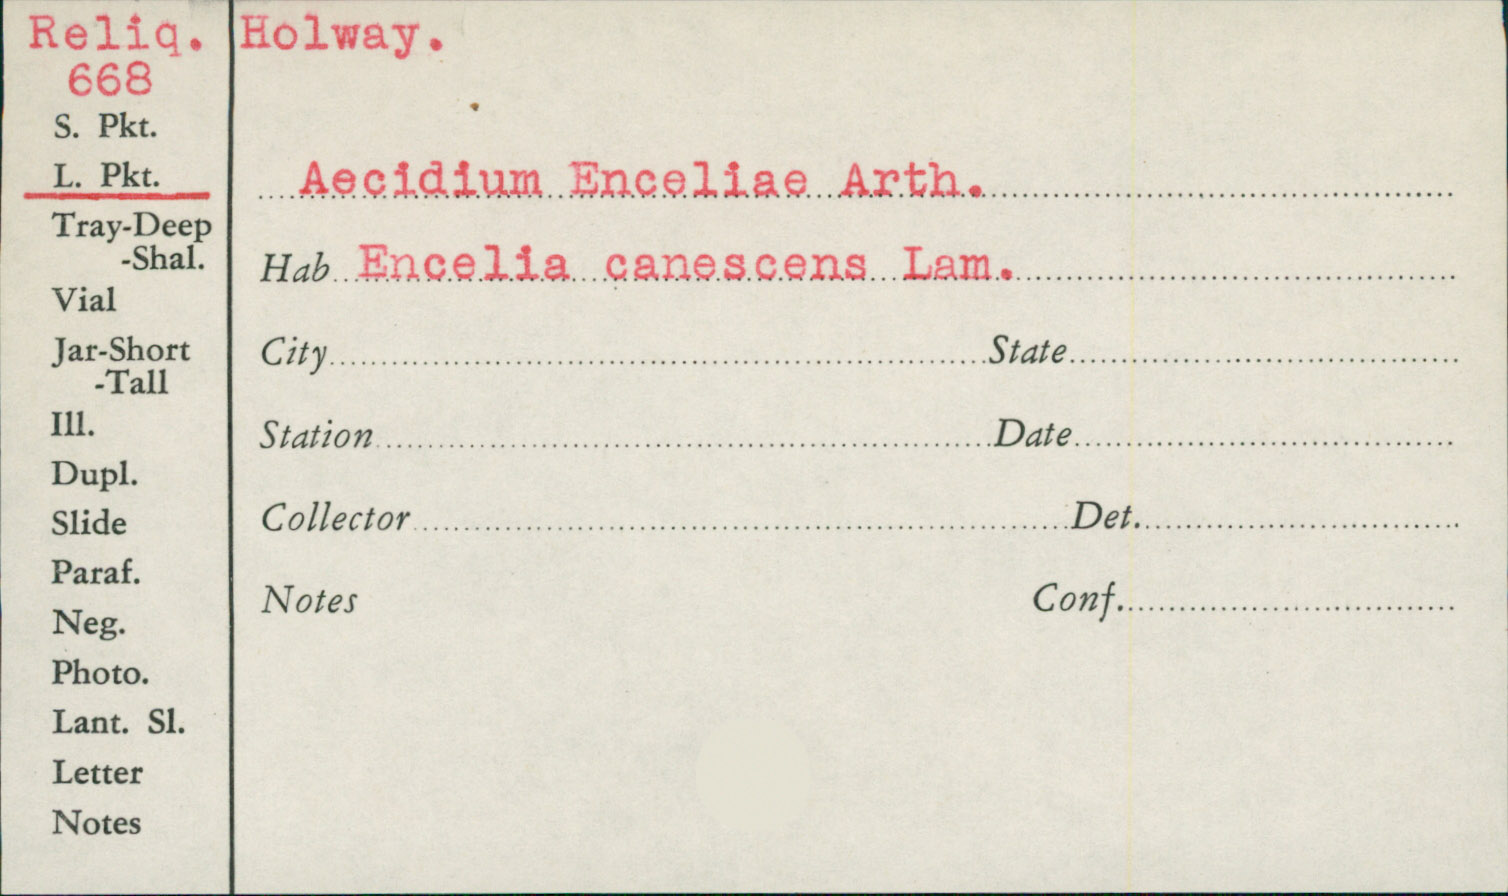 Aecidium enceliae image